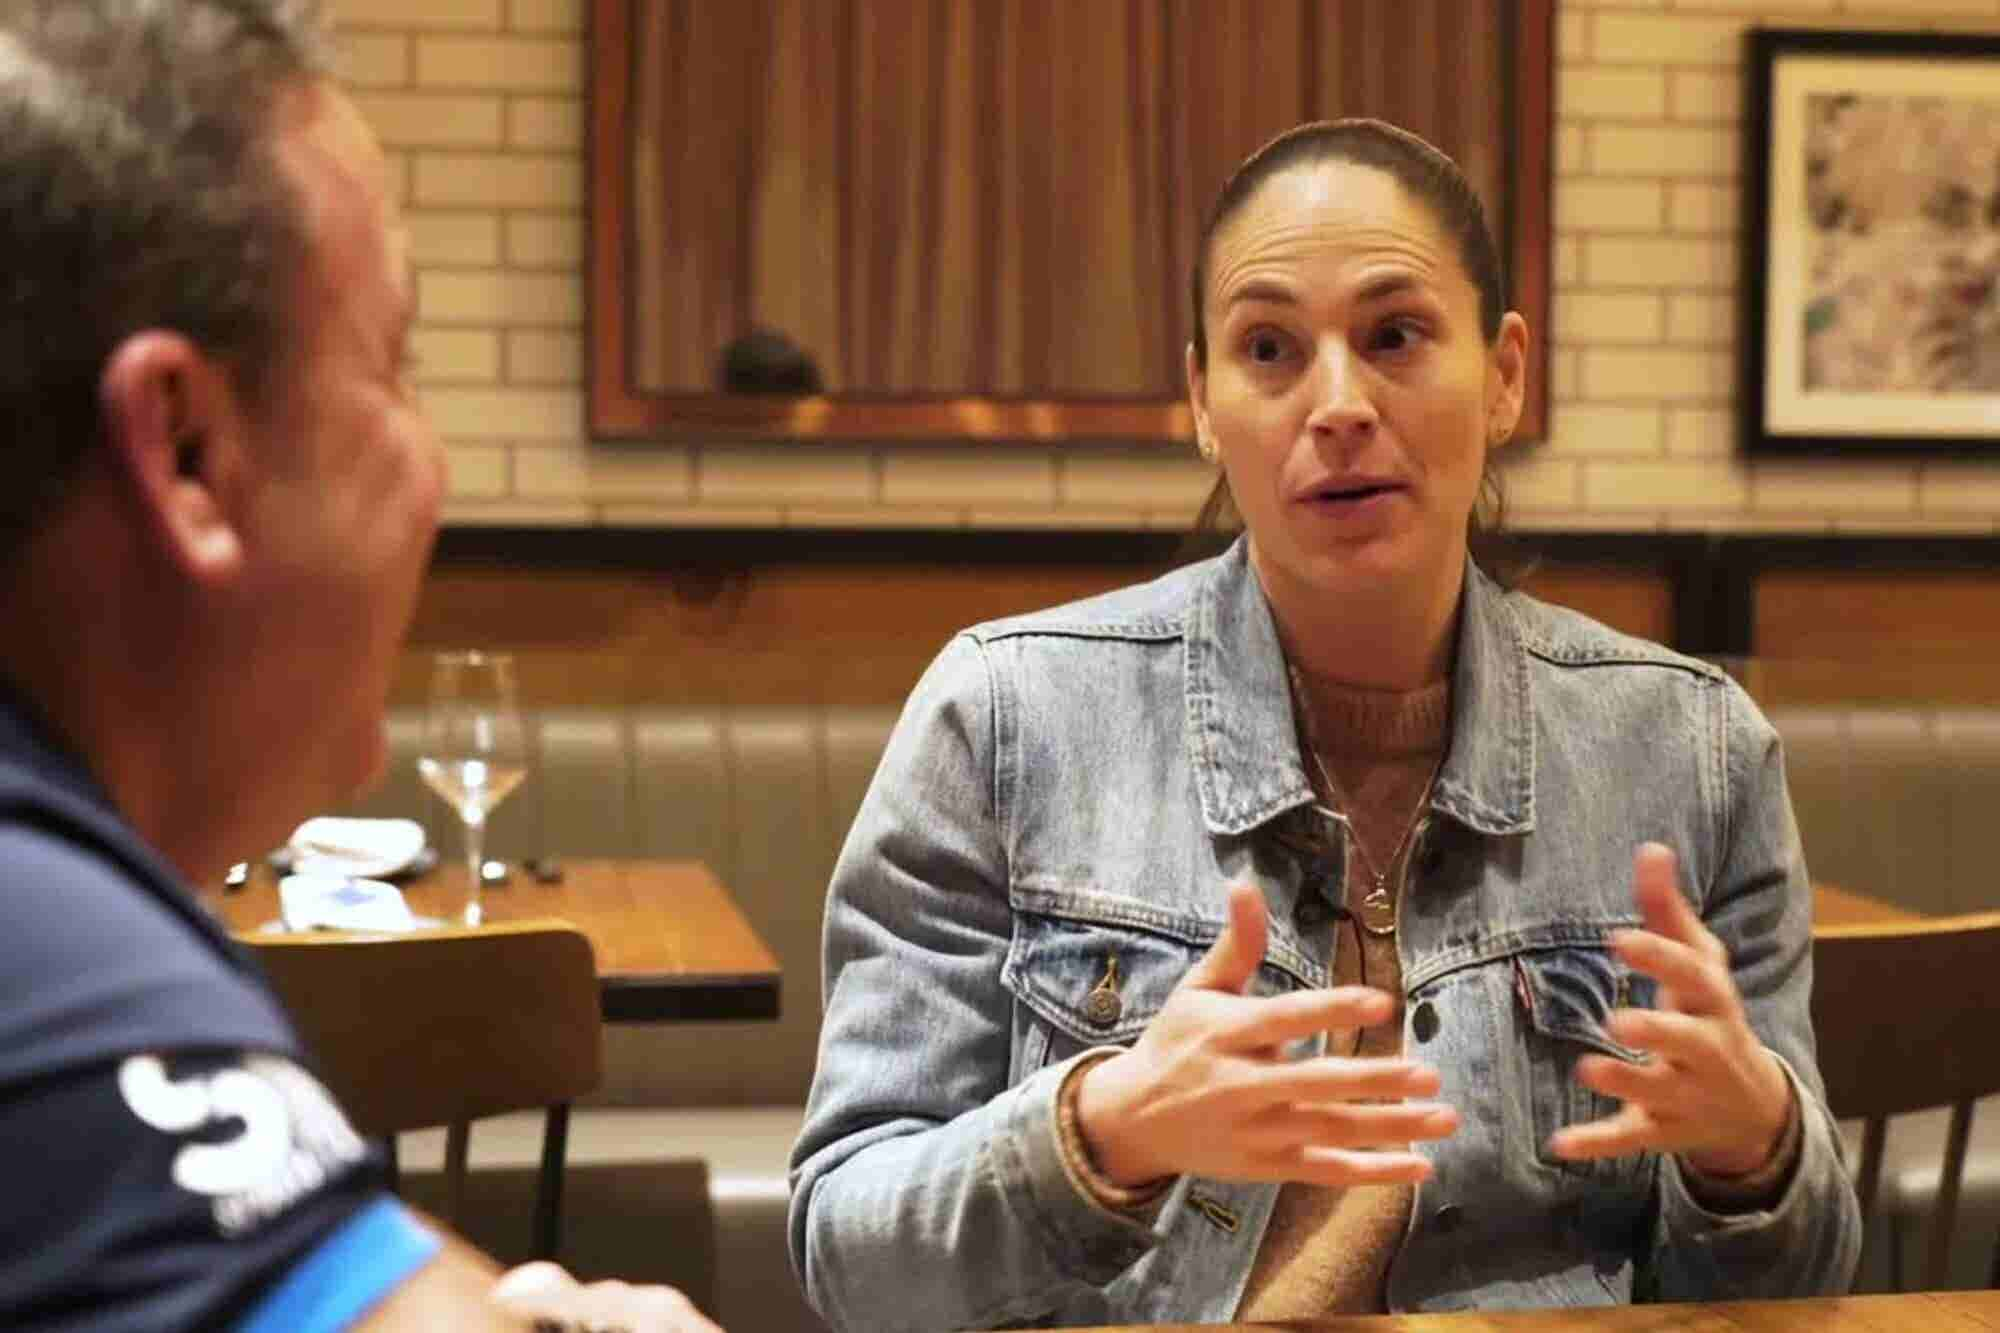 WNBA Legend Sue Bird Is Addicted to the Process of Winning